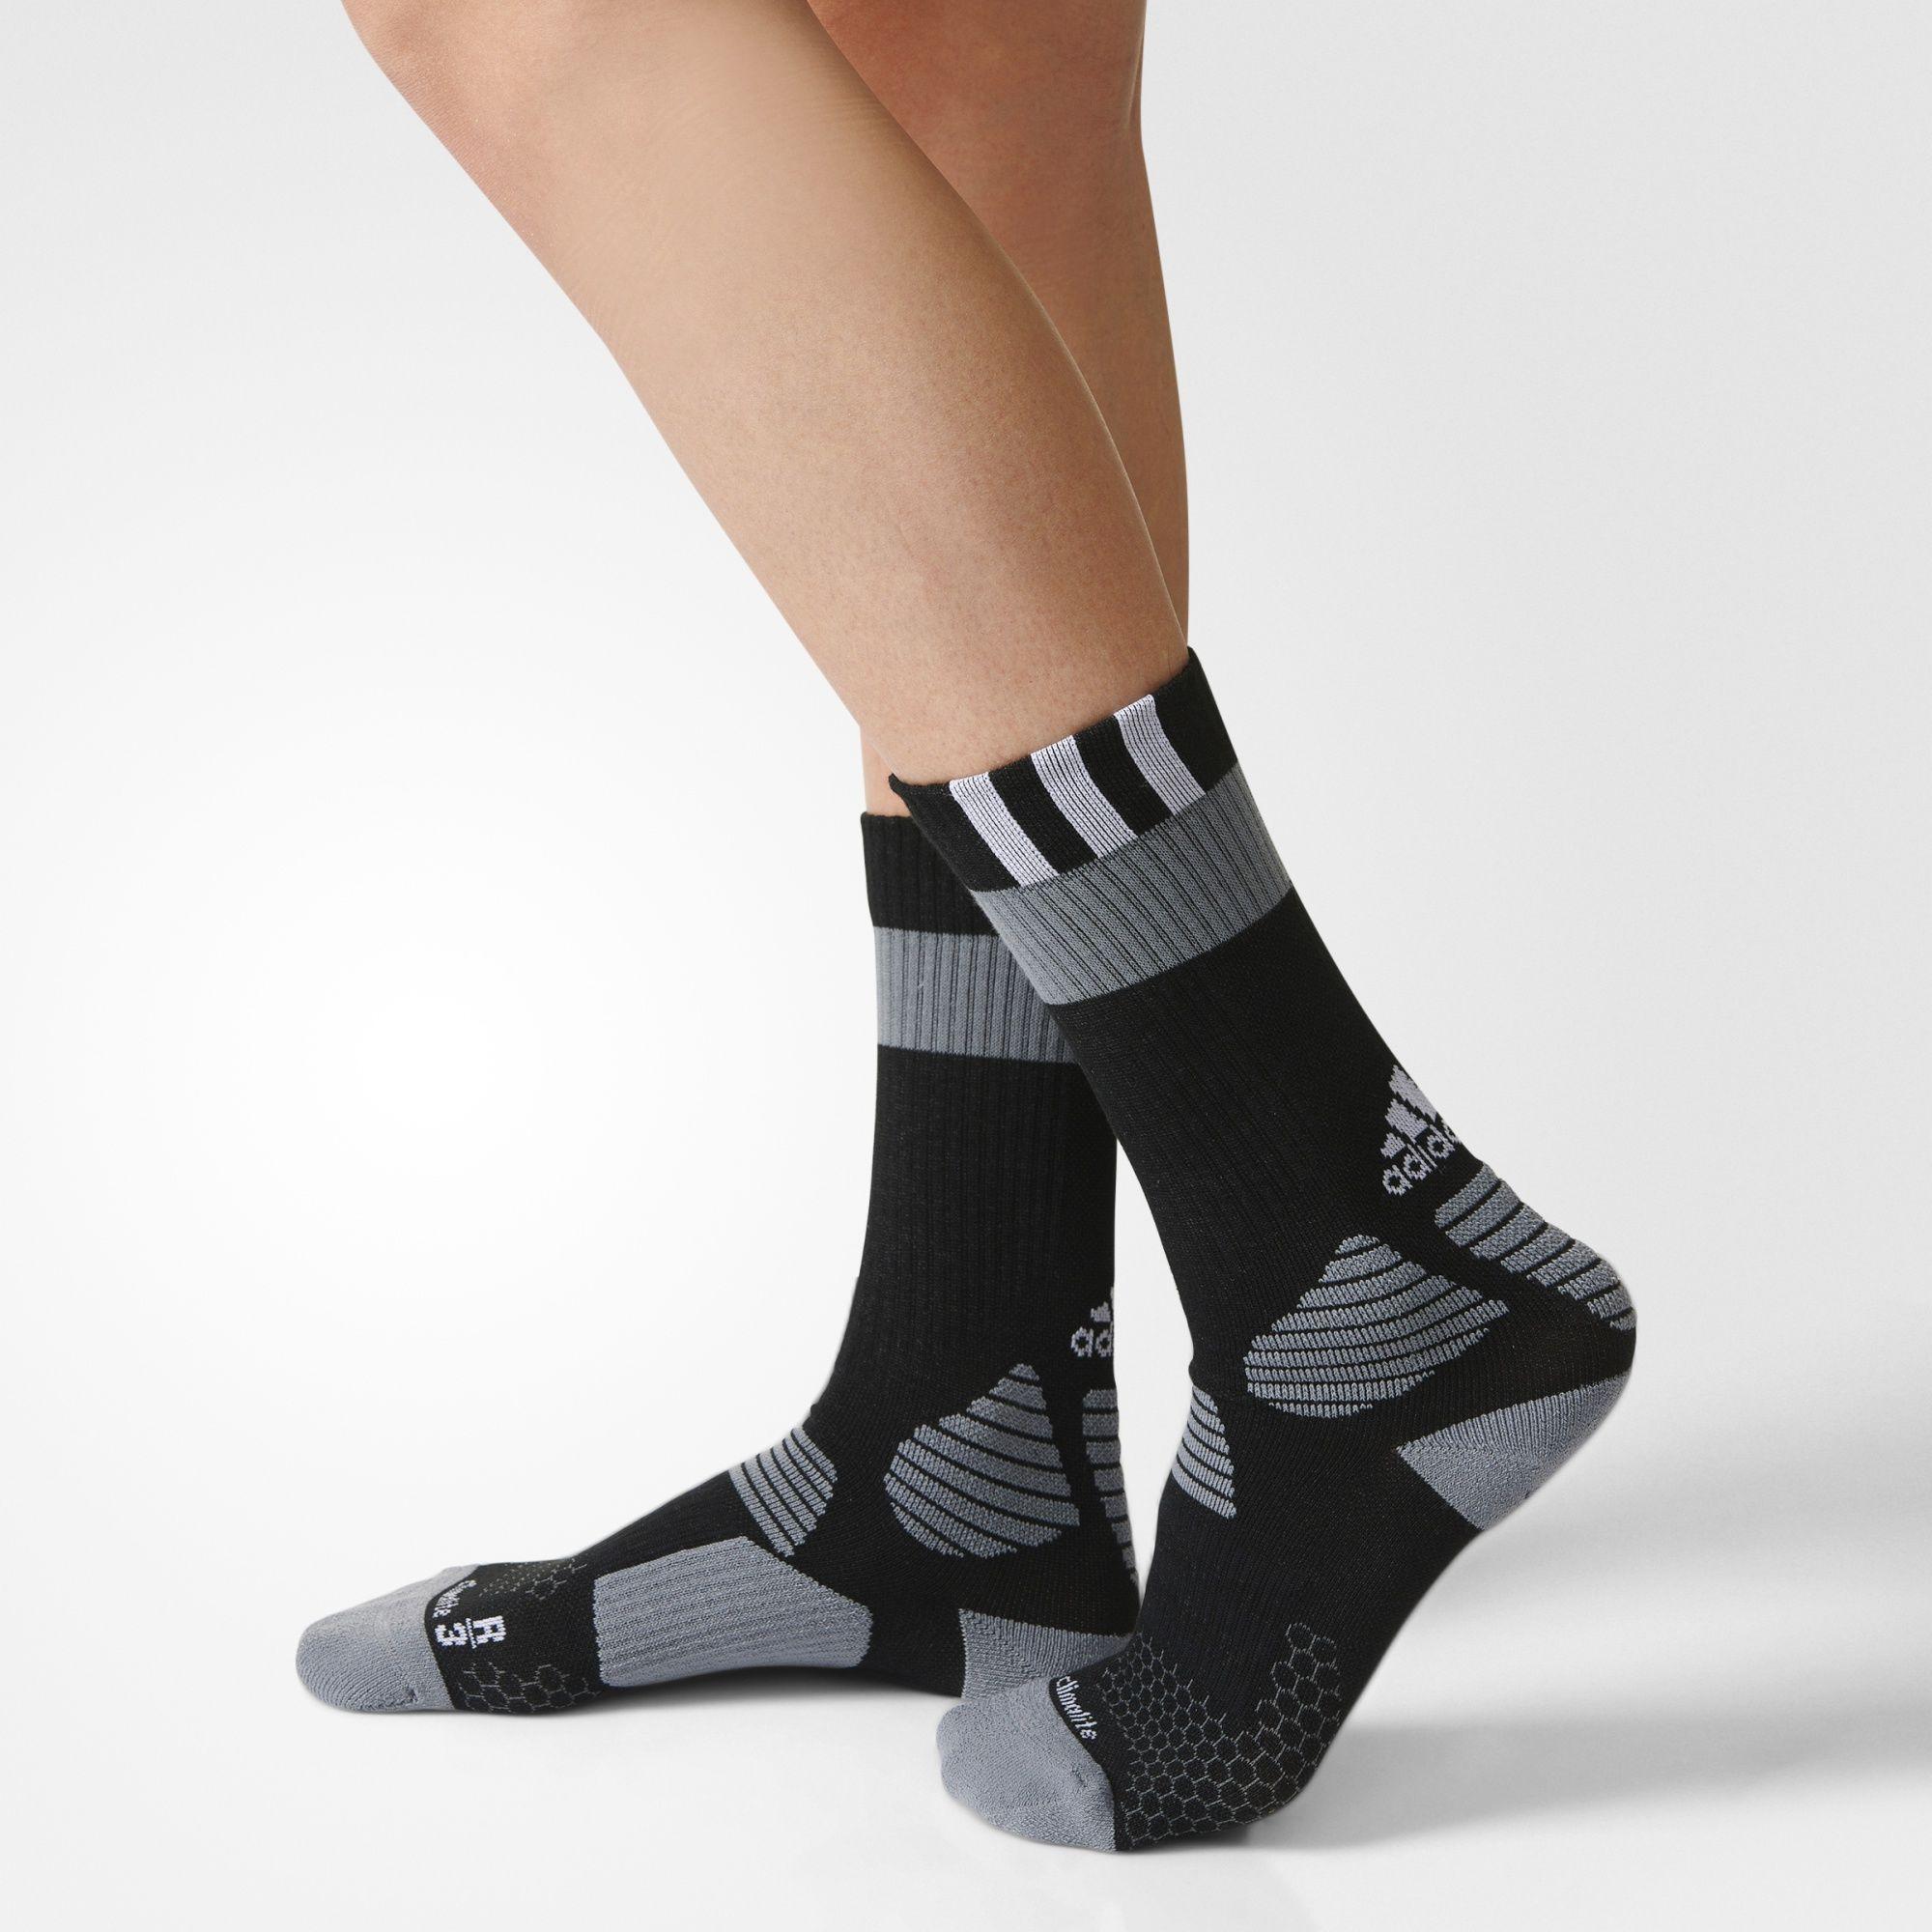 54d0f20238b adidas - ID Comfort Socks 1 Pair | kun994 | Socks, Adidas socks, Adidas